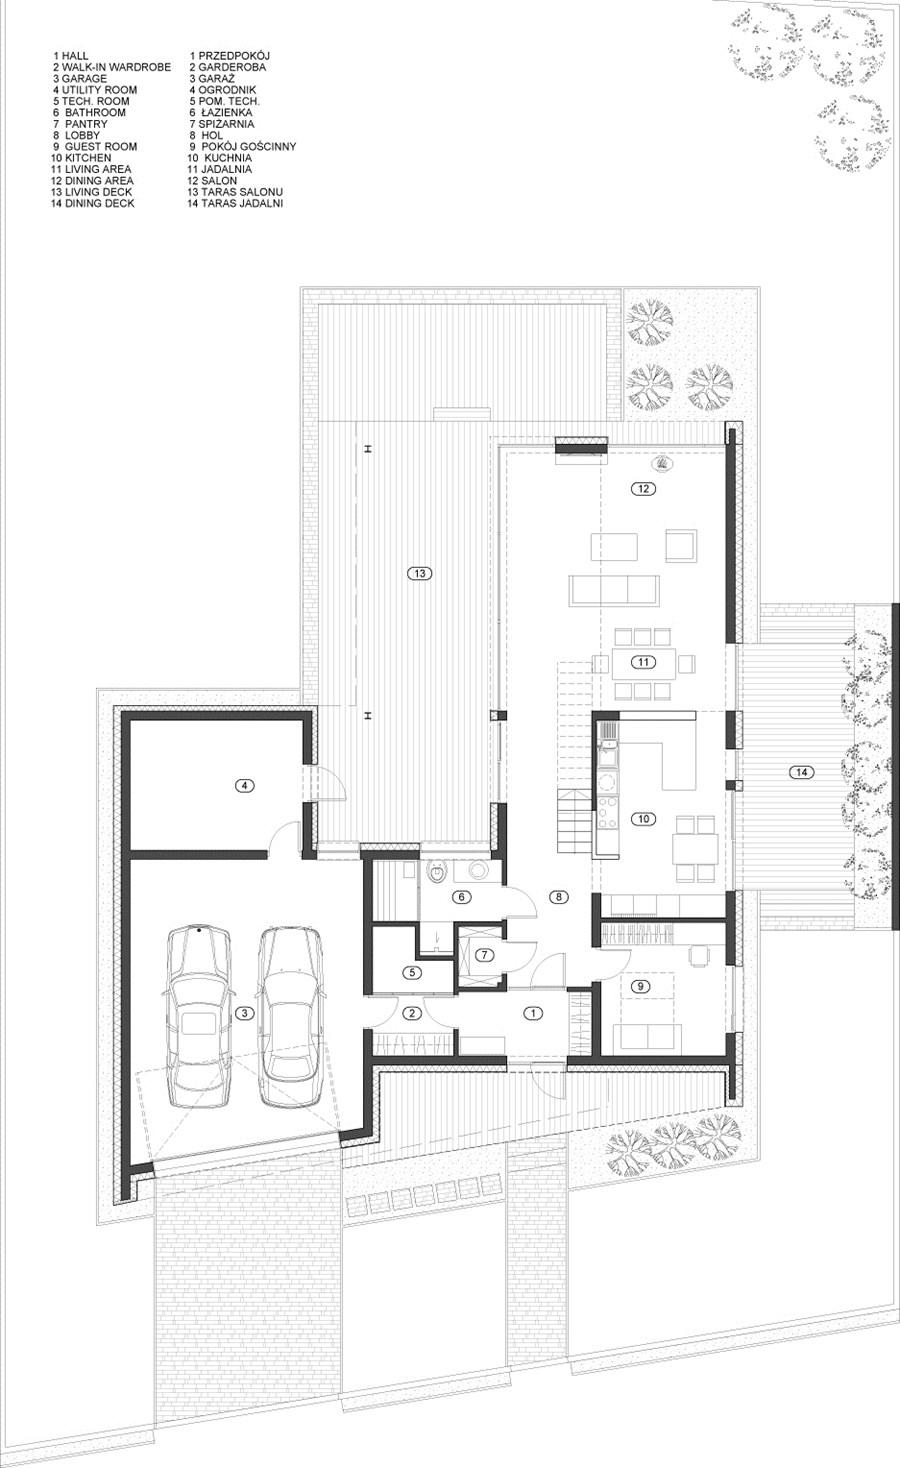 RYB house by BECZAK ARCHITEKCI 18